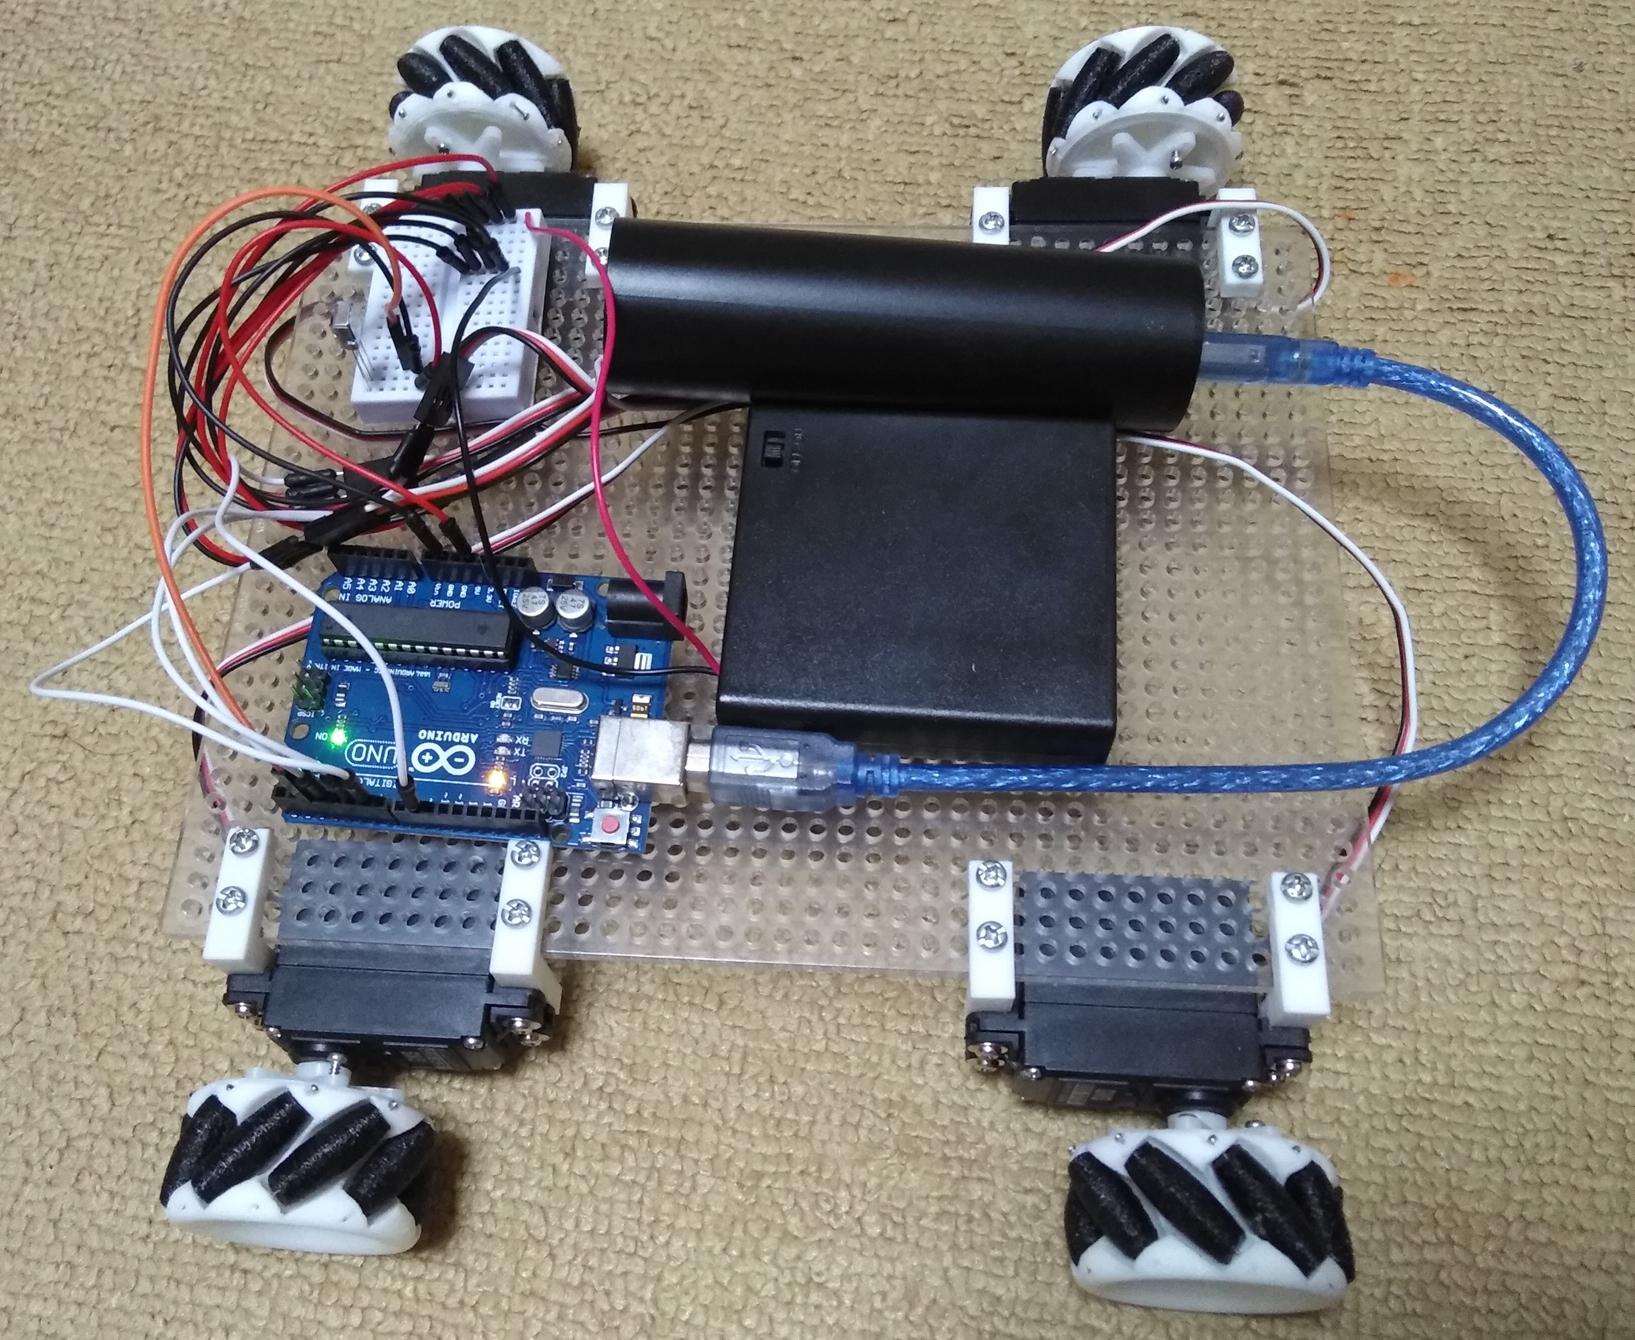 Arduino Uno互換機を使ってメカナムホイールのラジコンカーを作った